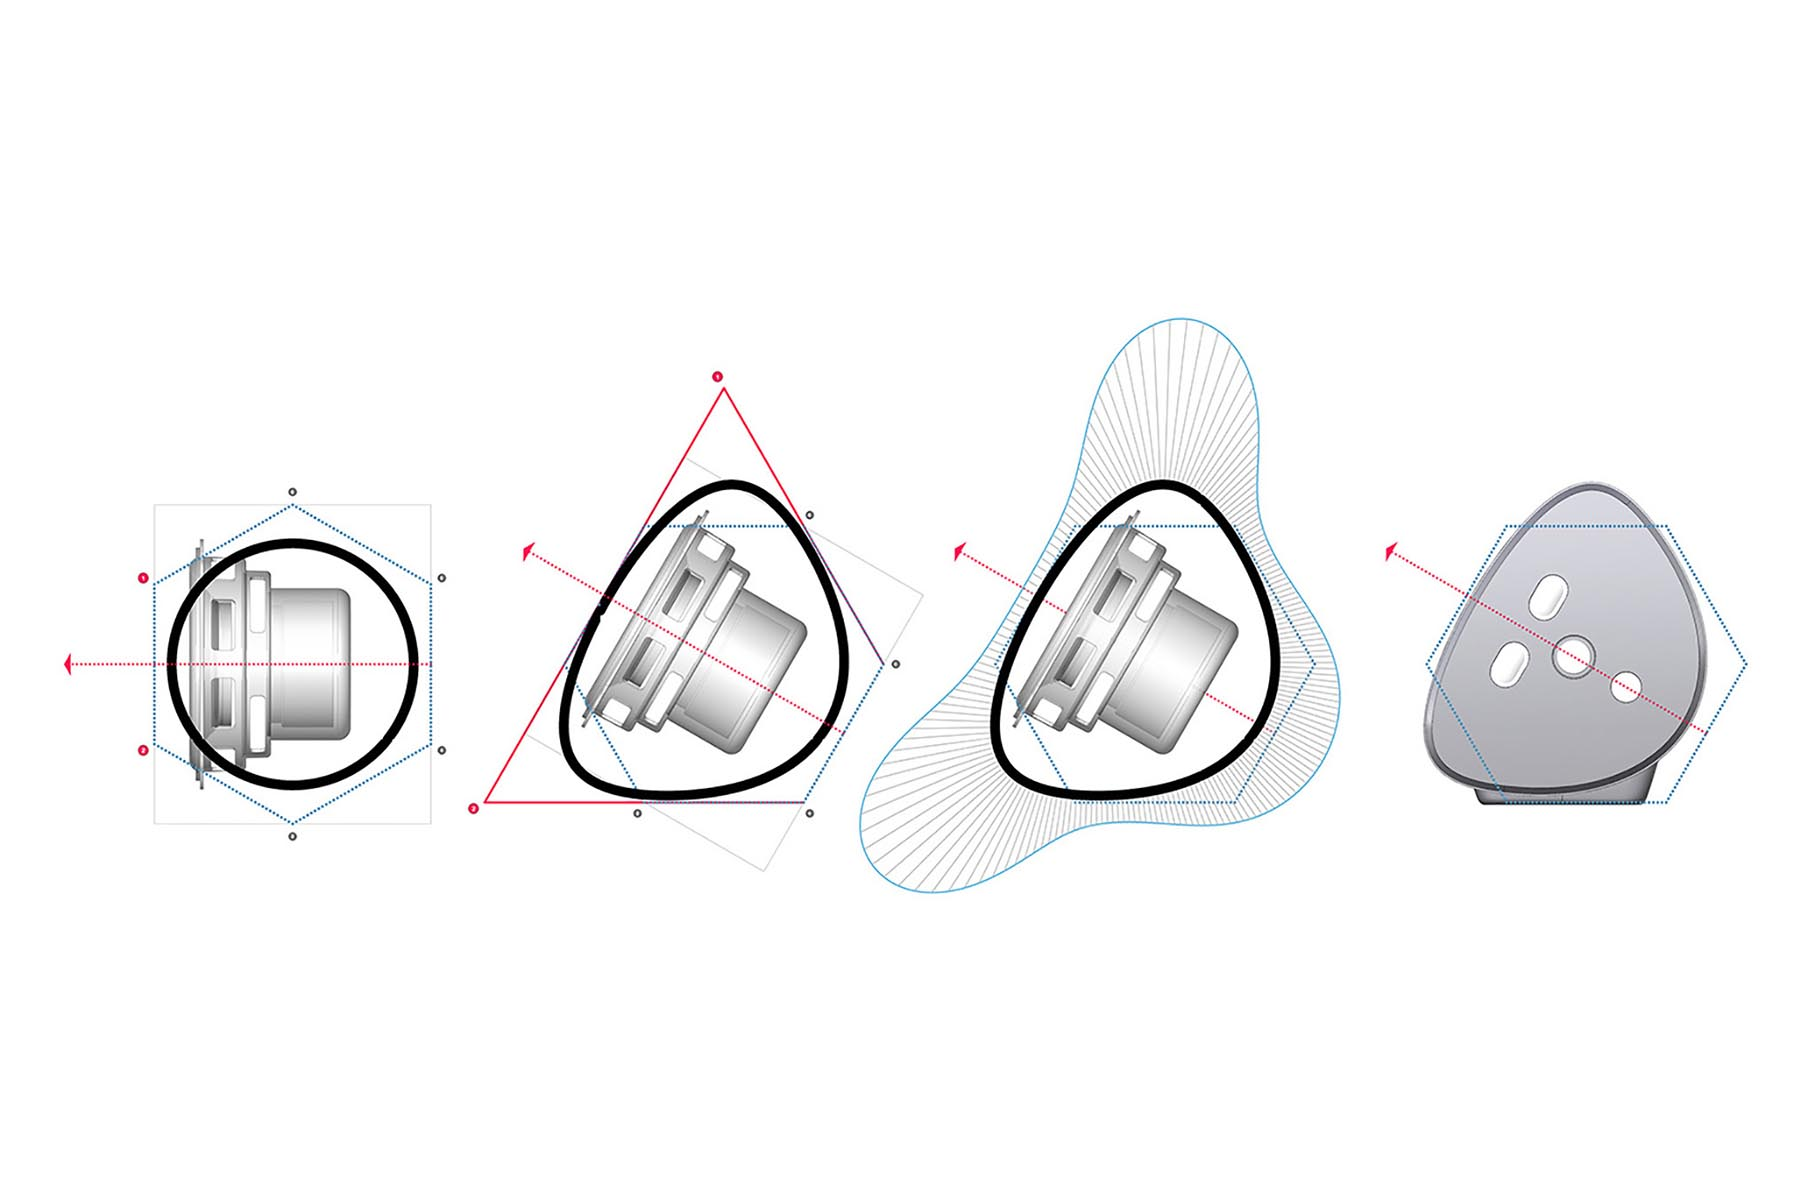 kef-muo-speaker-ross-lovegrove-computational-design-andrea-locatelli-01.jpg